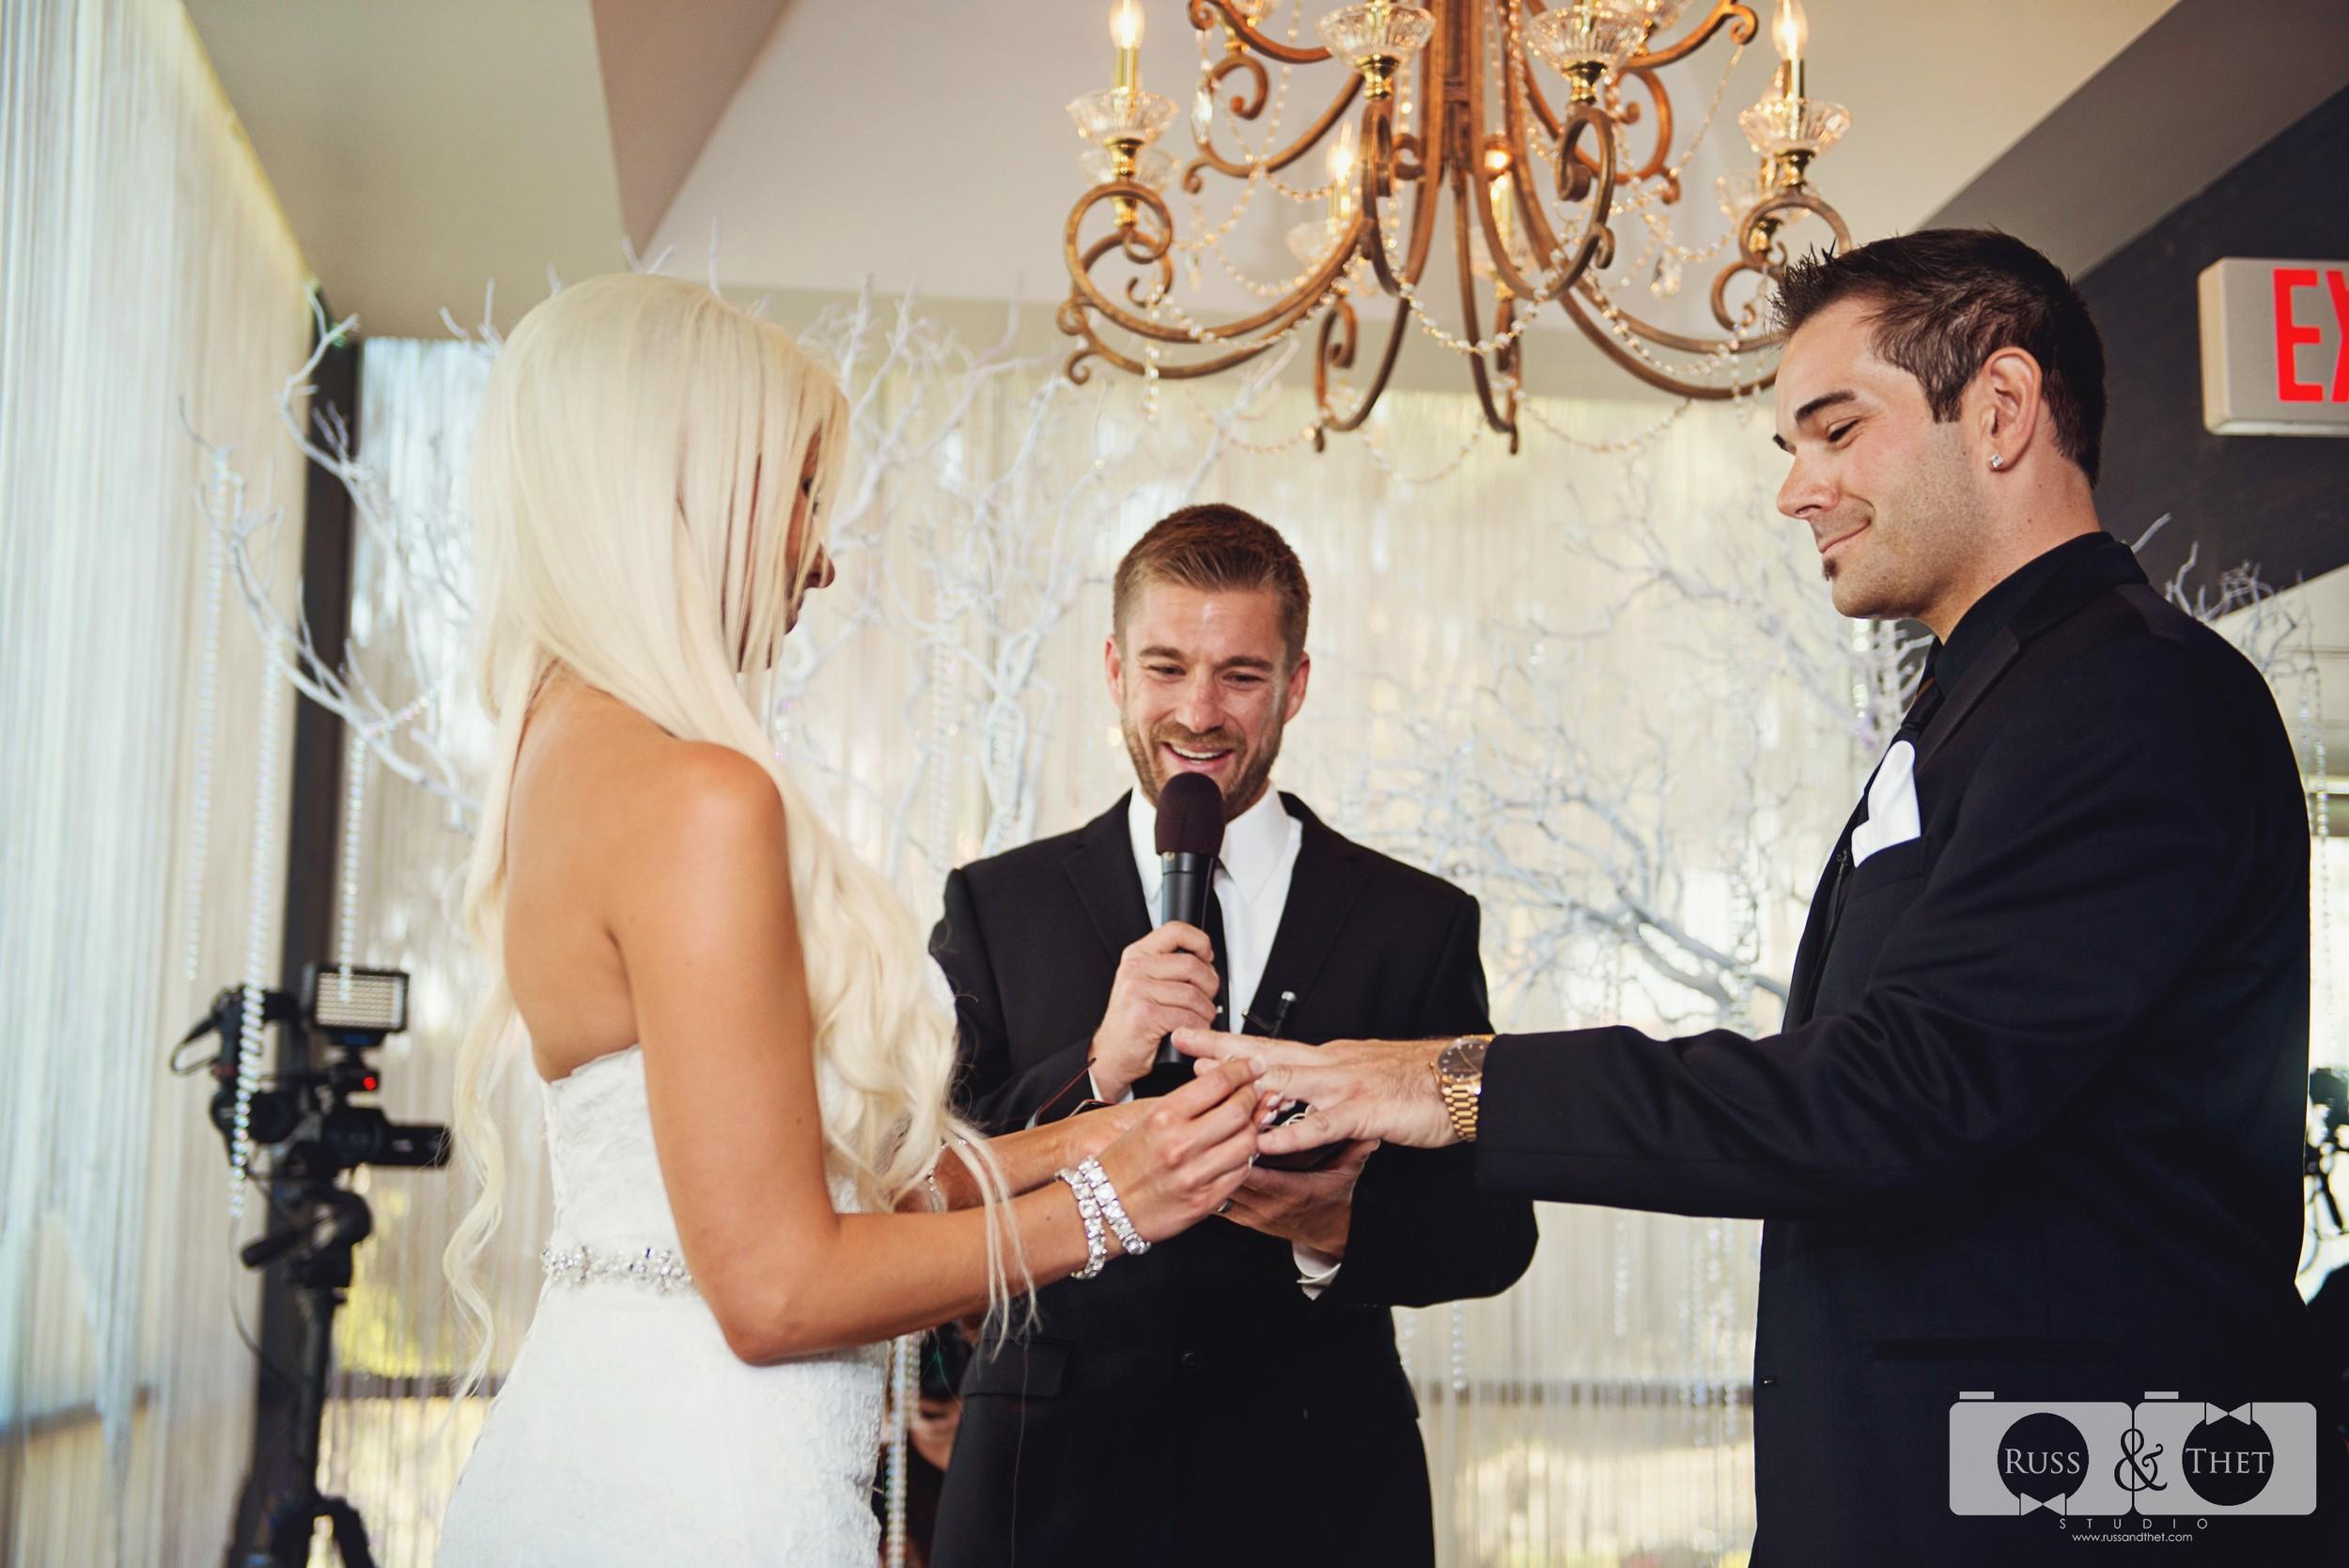 Jon&Kimee-The-Hills-Hotel-Wedding-Photographer (56).jpg